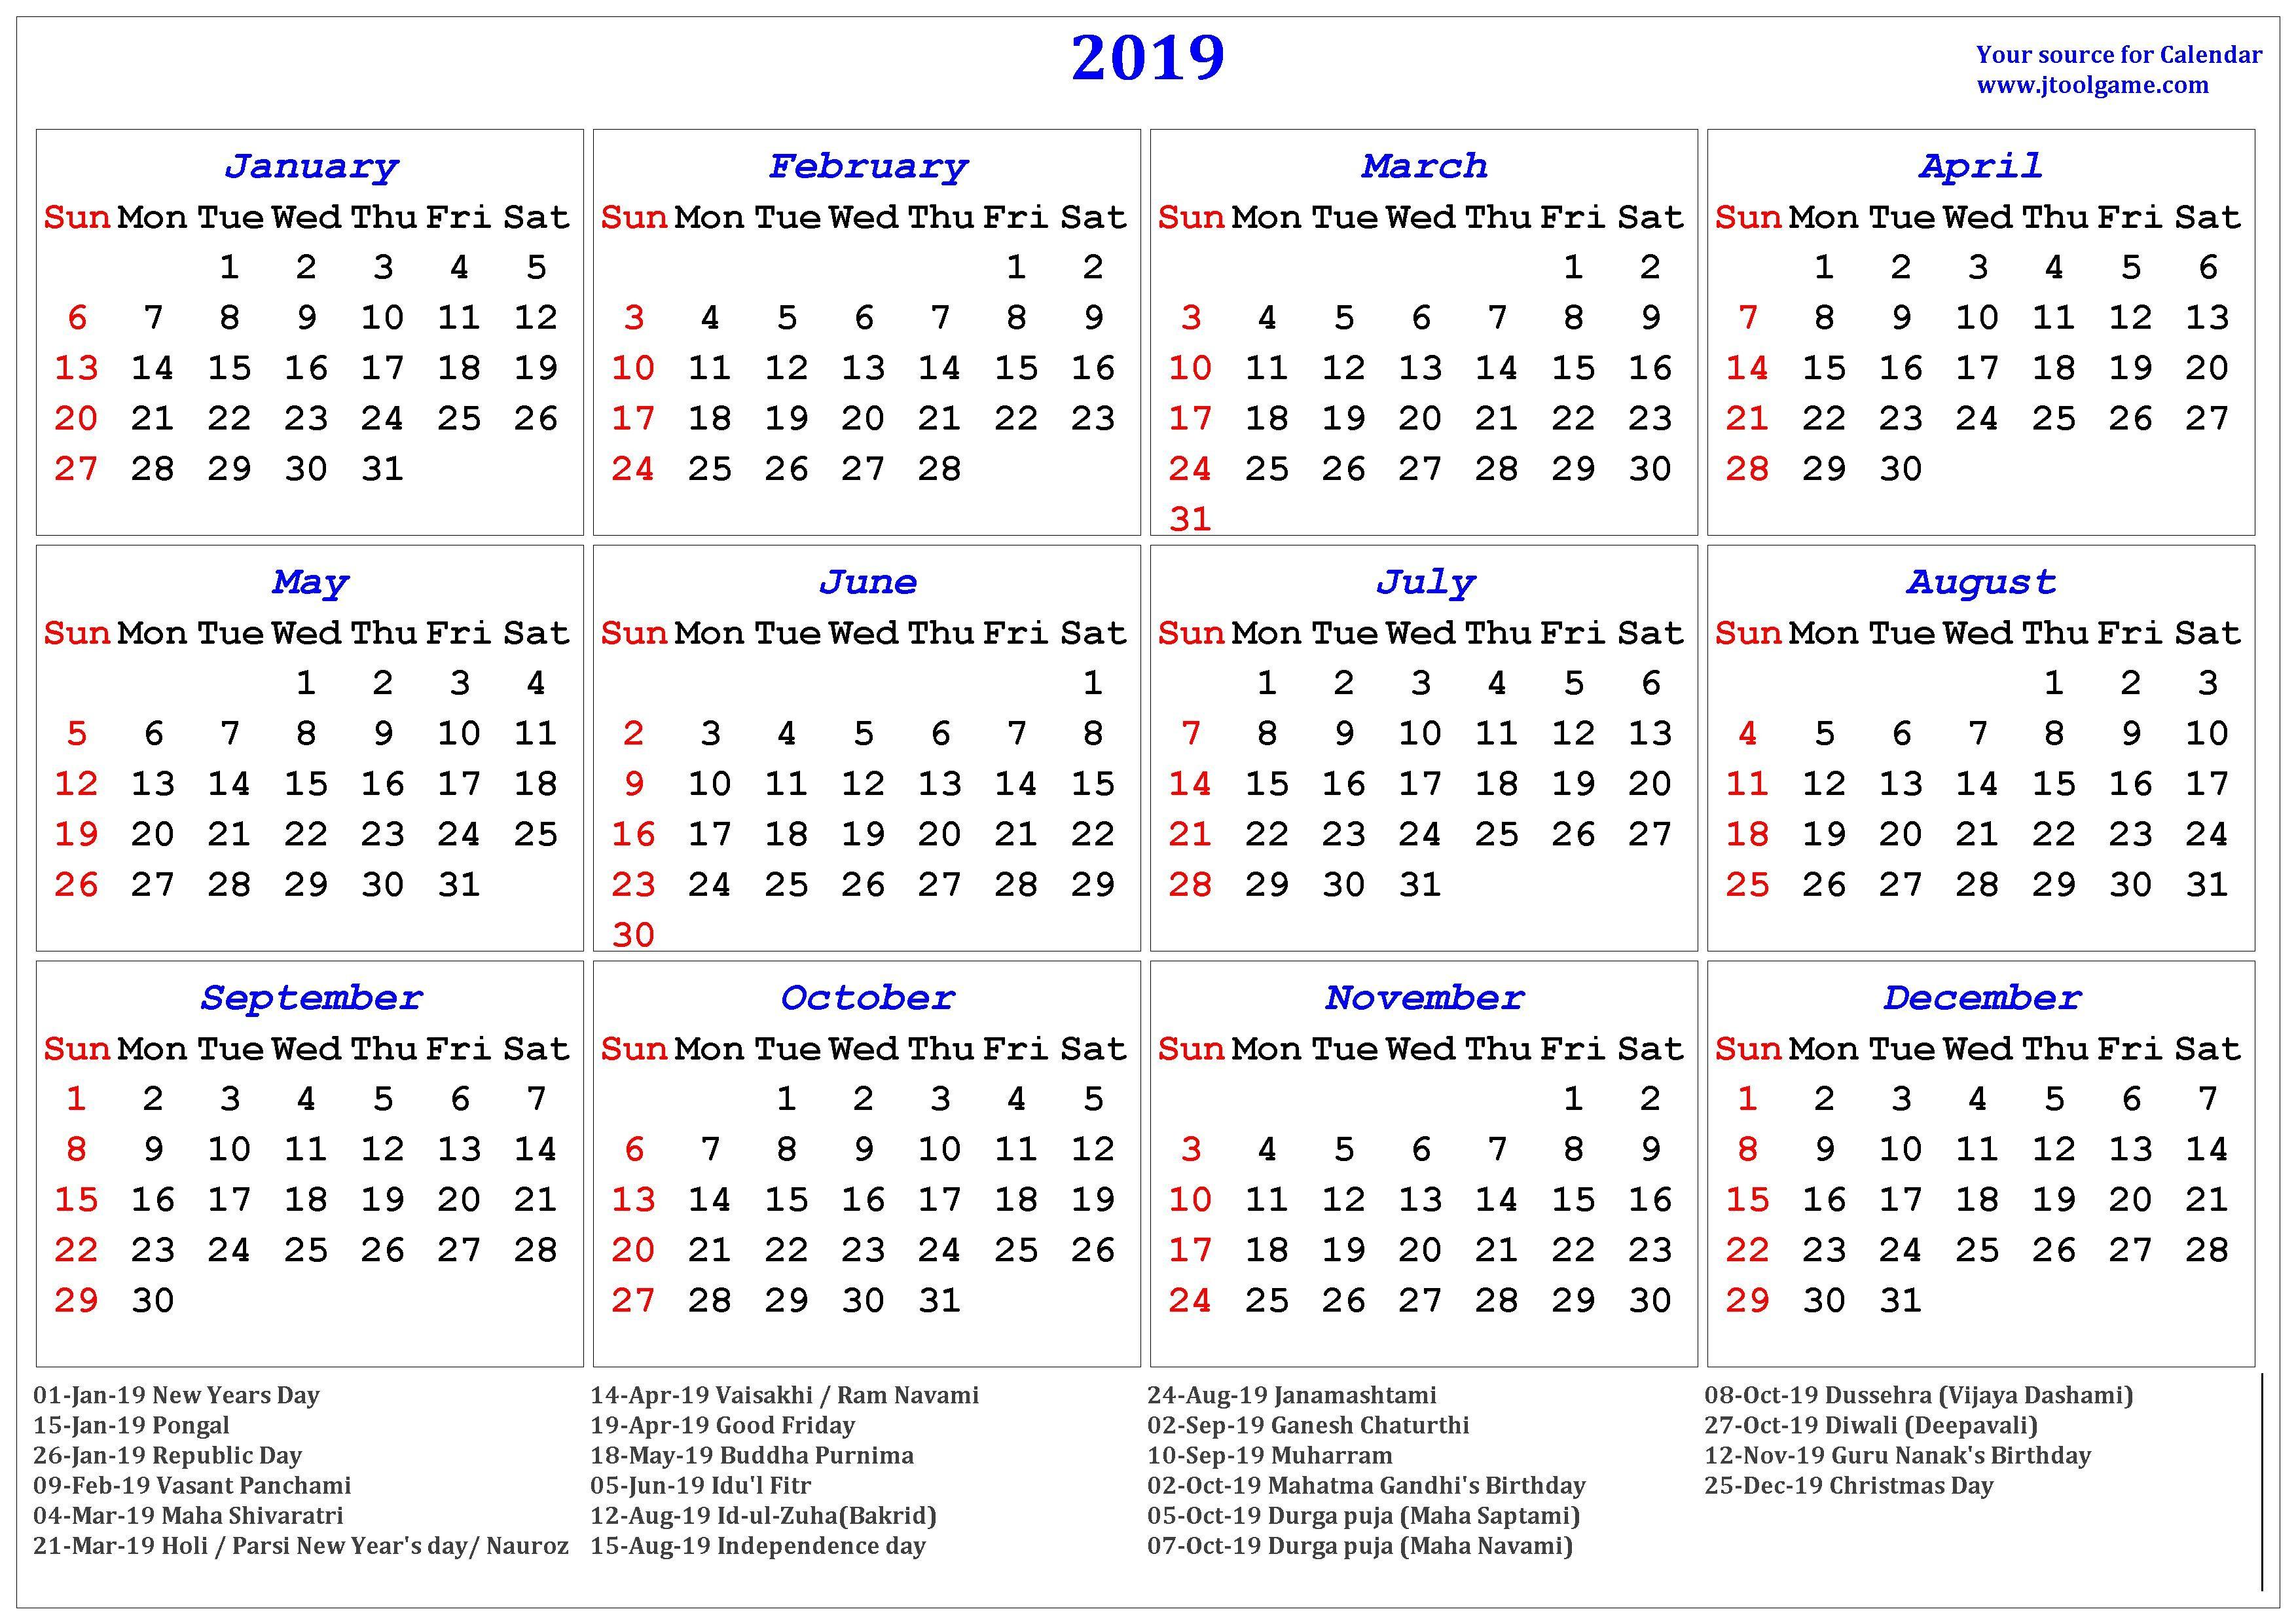 March Calendar Canada Más Caliente Calendar 2019 Holidays India Of March Calendar Canada Más Arriba-a-fecha Kalender Ausdrucken 2015 Schön Printable 0d Calendars Kalender